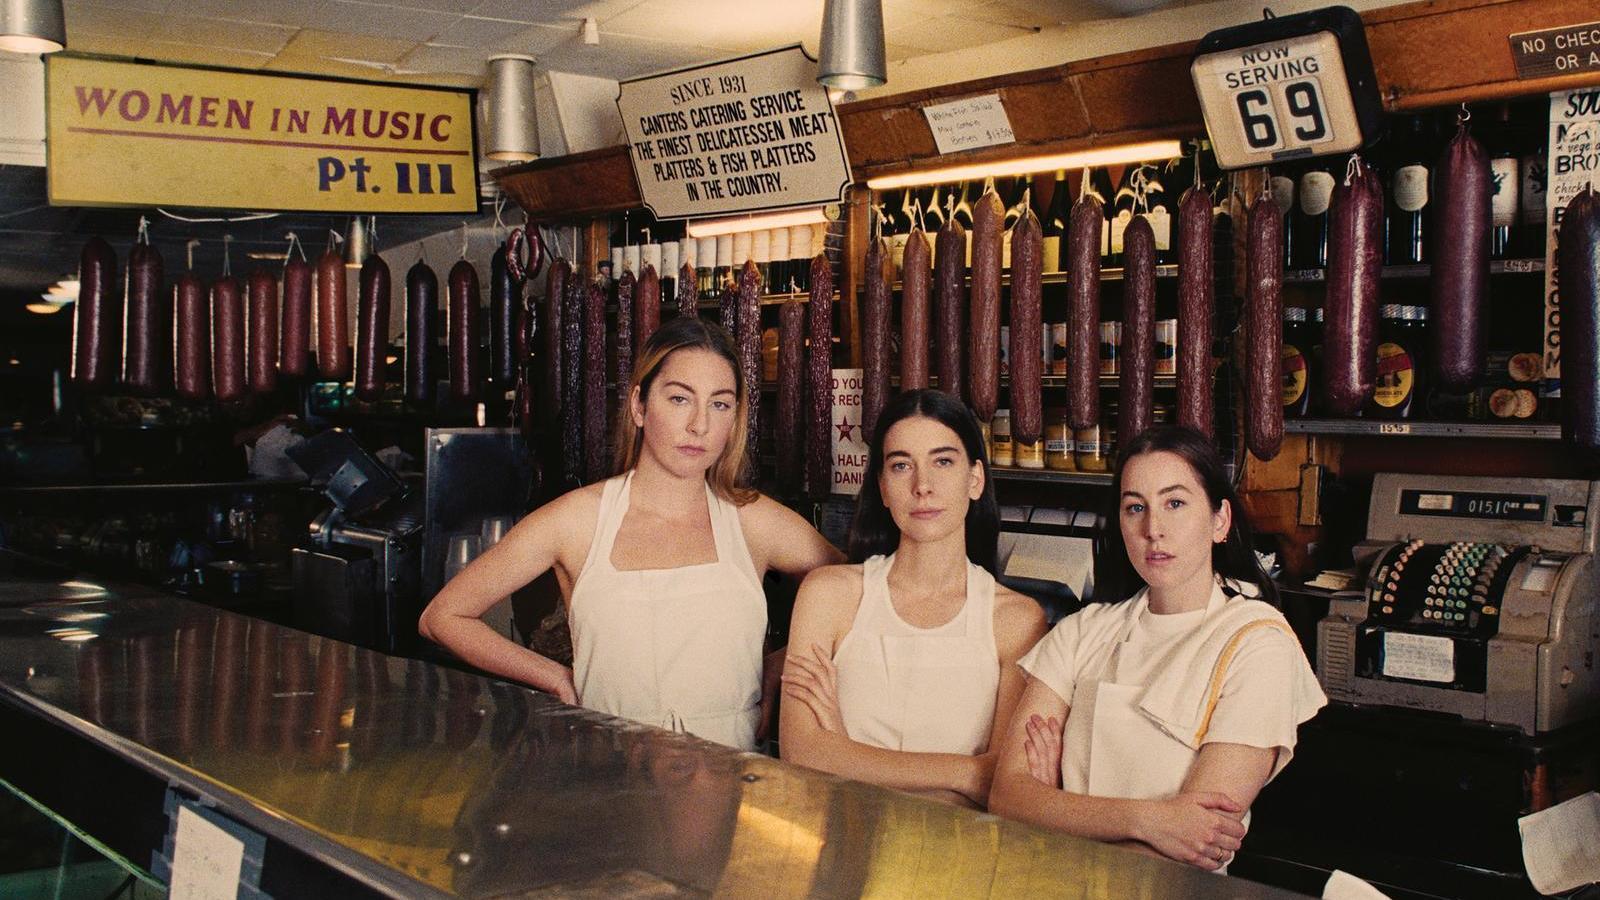 Haim - Women in Music Pt. III